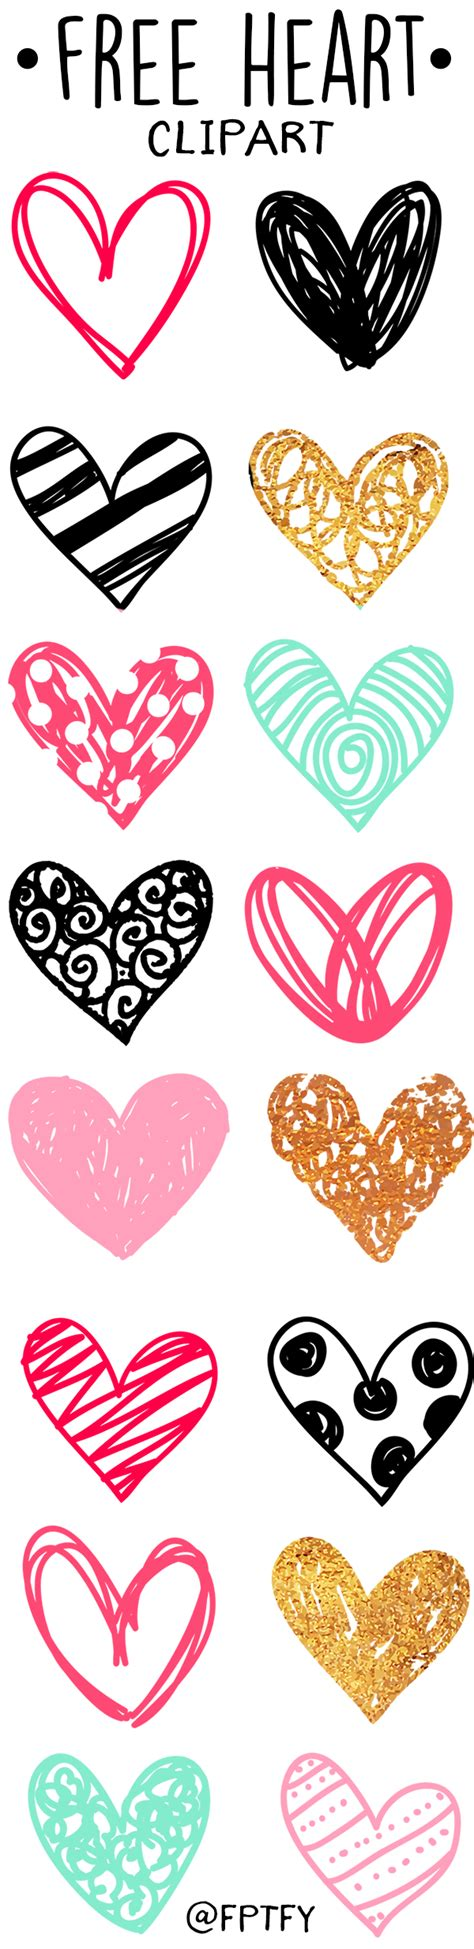 doodle hearts free doodle clip clip doodles and cricut